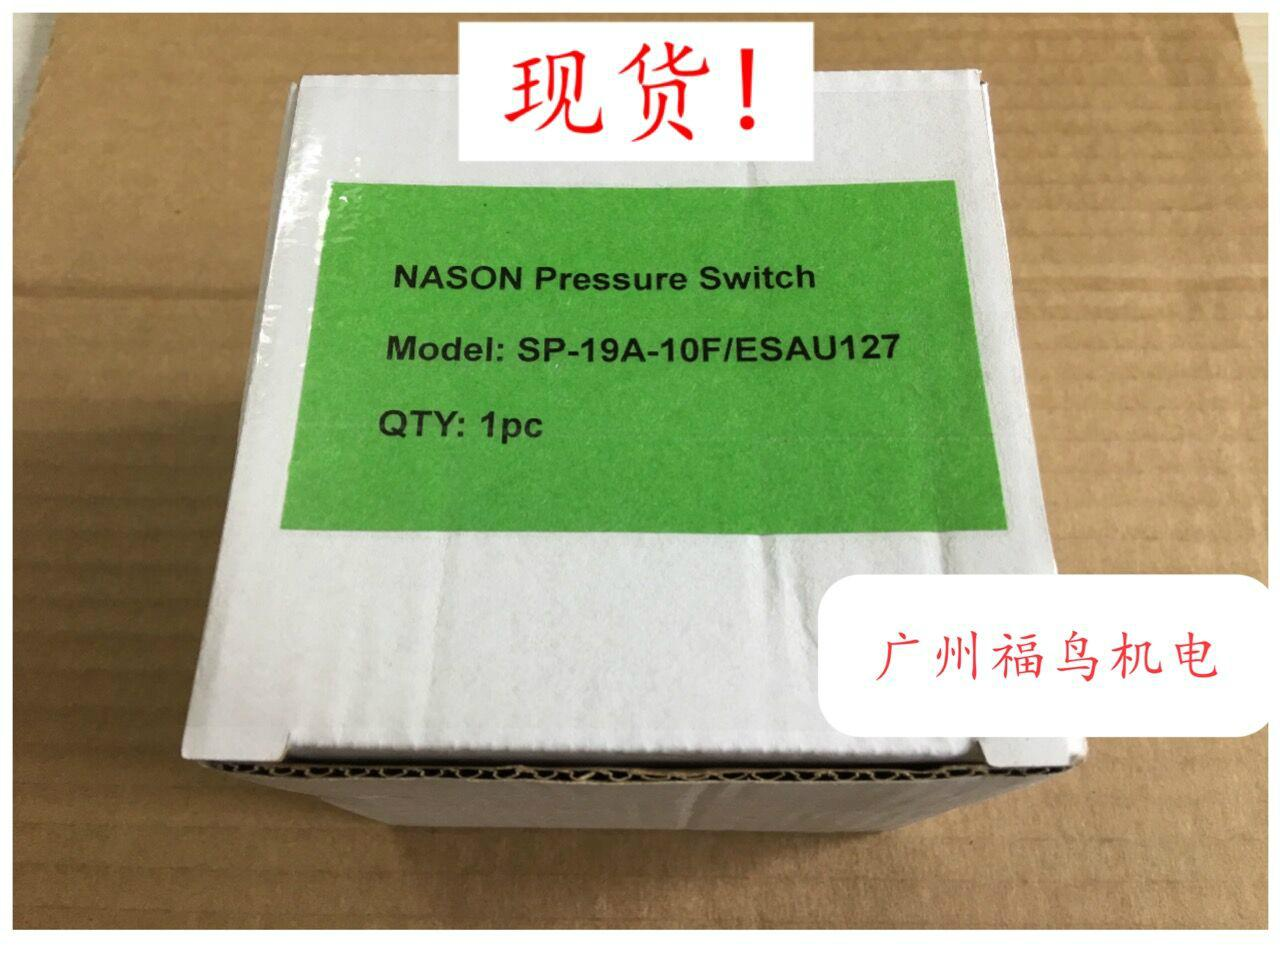 NASON壓力開關, 型號: SP-19A-10F/ESAU127